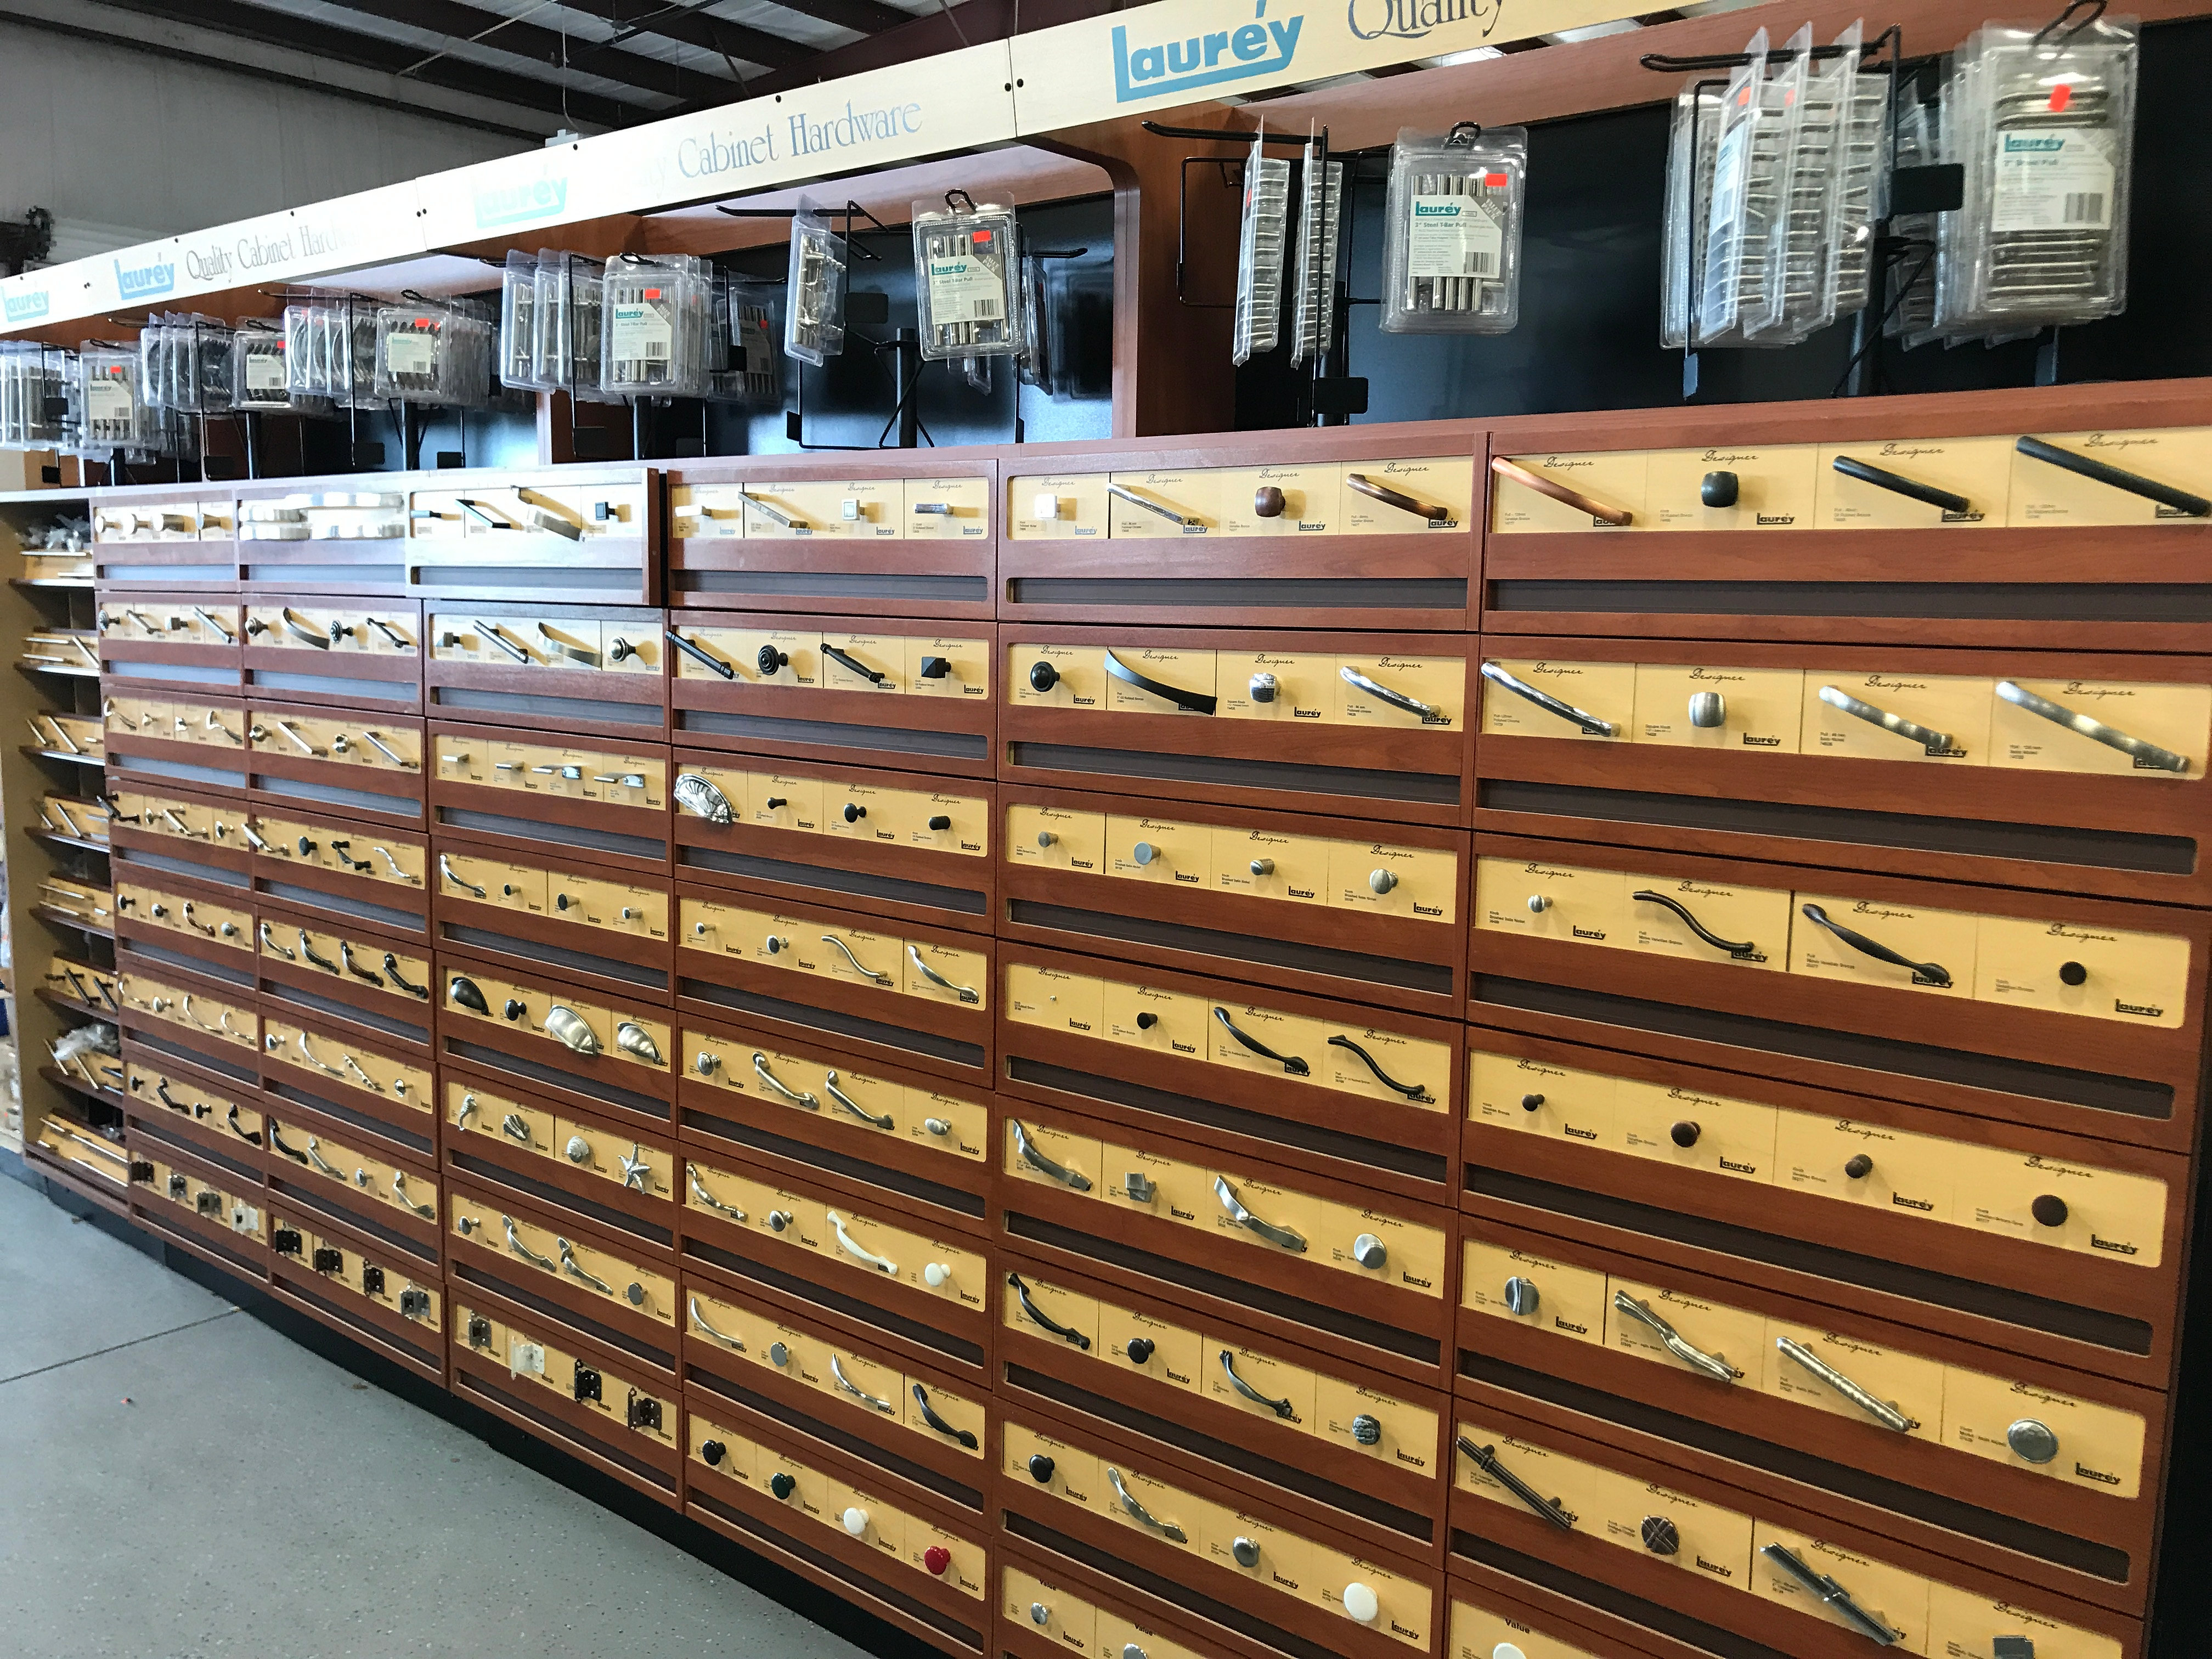 Kitchen Cabinet Handles Melbourne 321 Cabinets Kitchen Cabinets Melbourne Florida Knobs By Laurey